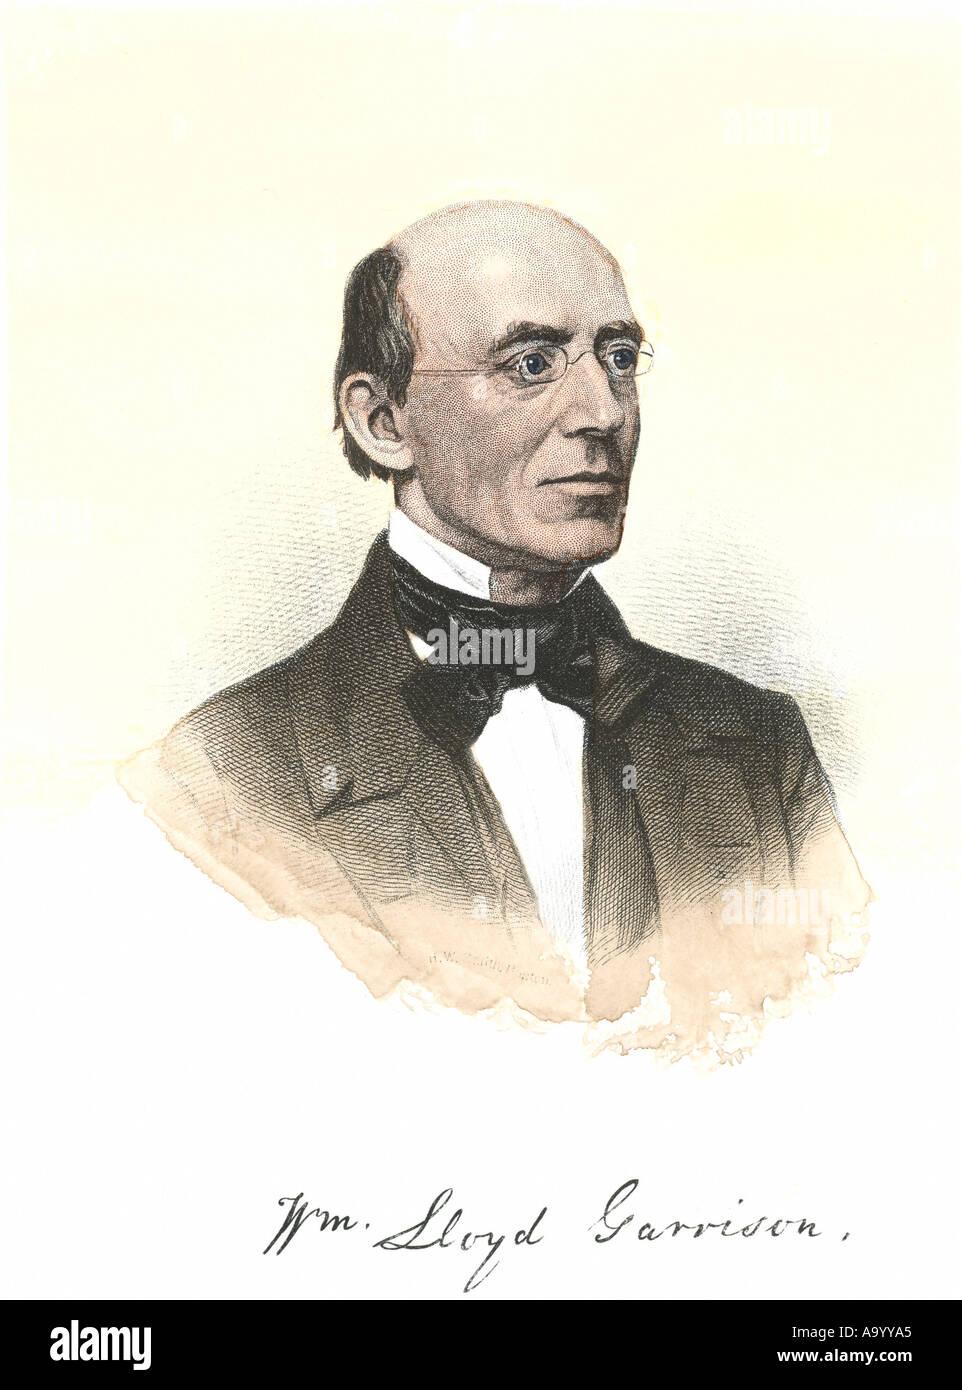 William Lloyd Garrison portrait with autograph - Stock Image